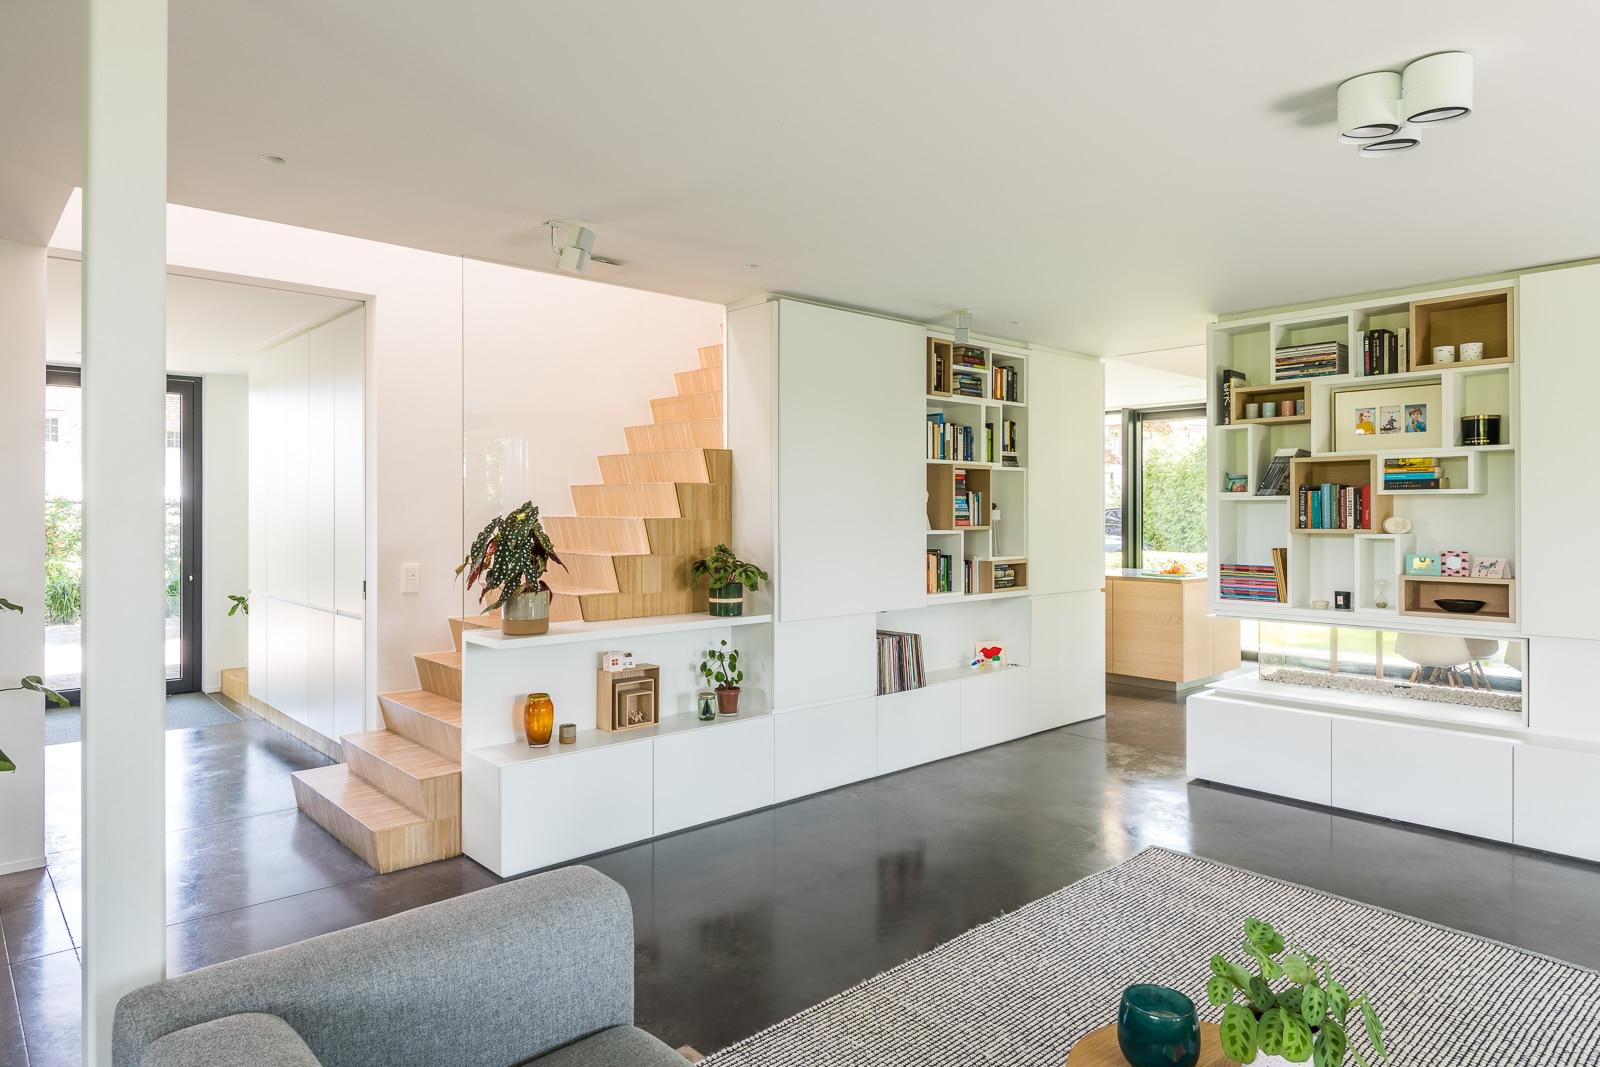 BaeyensBeck Kjell 038web | Baeyens & Beck architecten Gent | architect nieuwbouw renovatie interieur | high end | architectenbureau